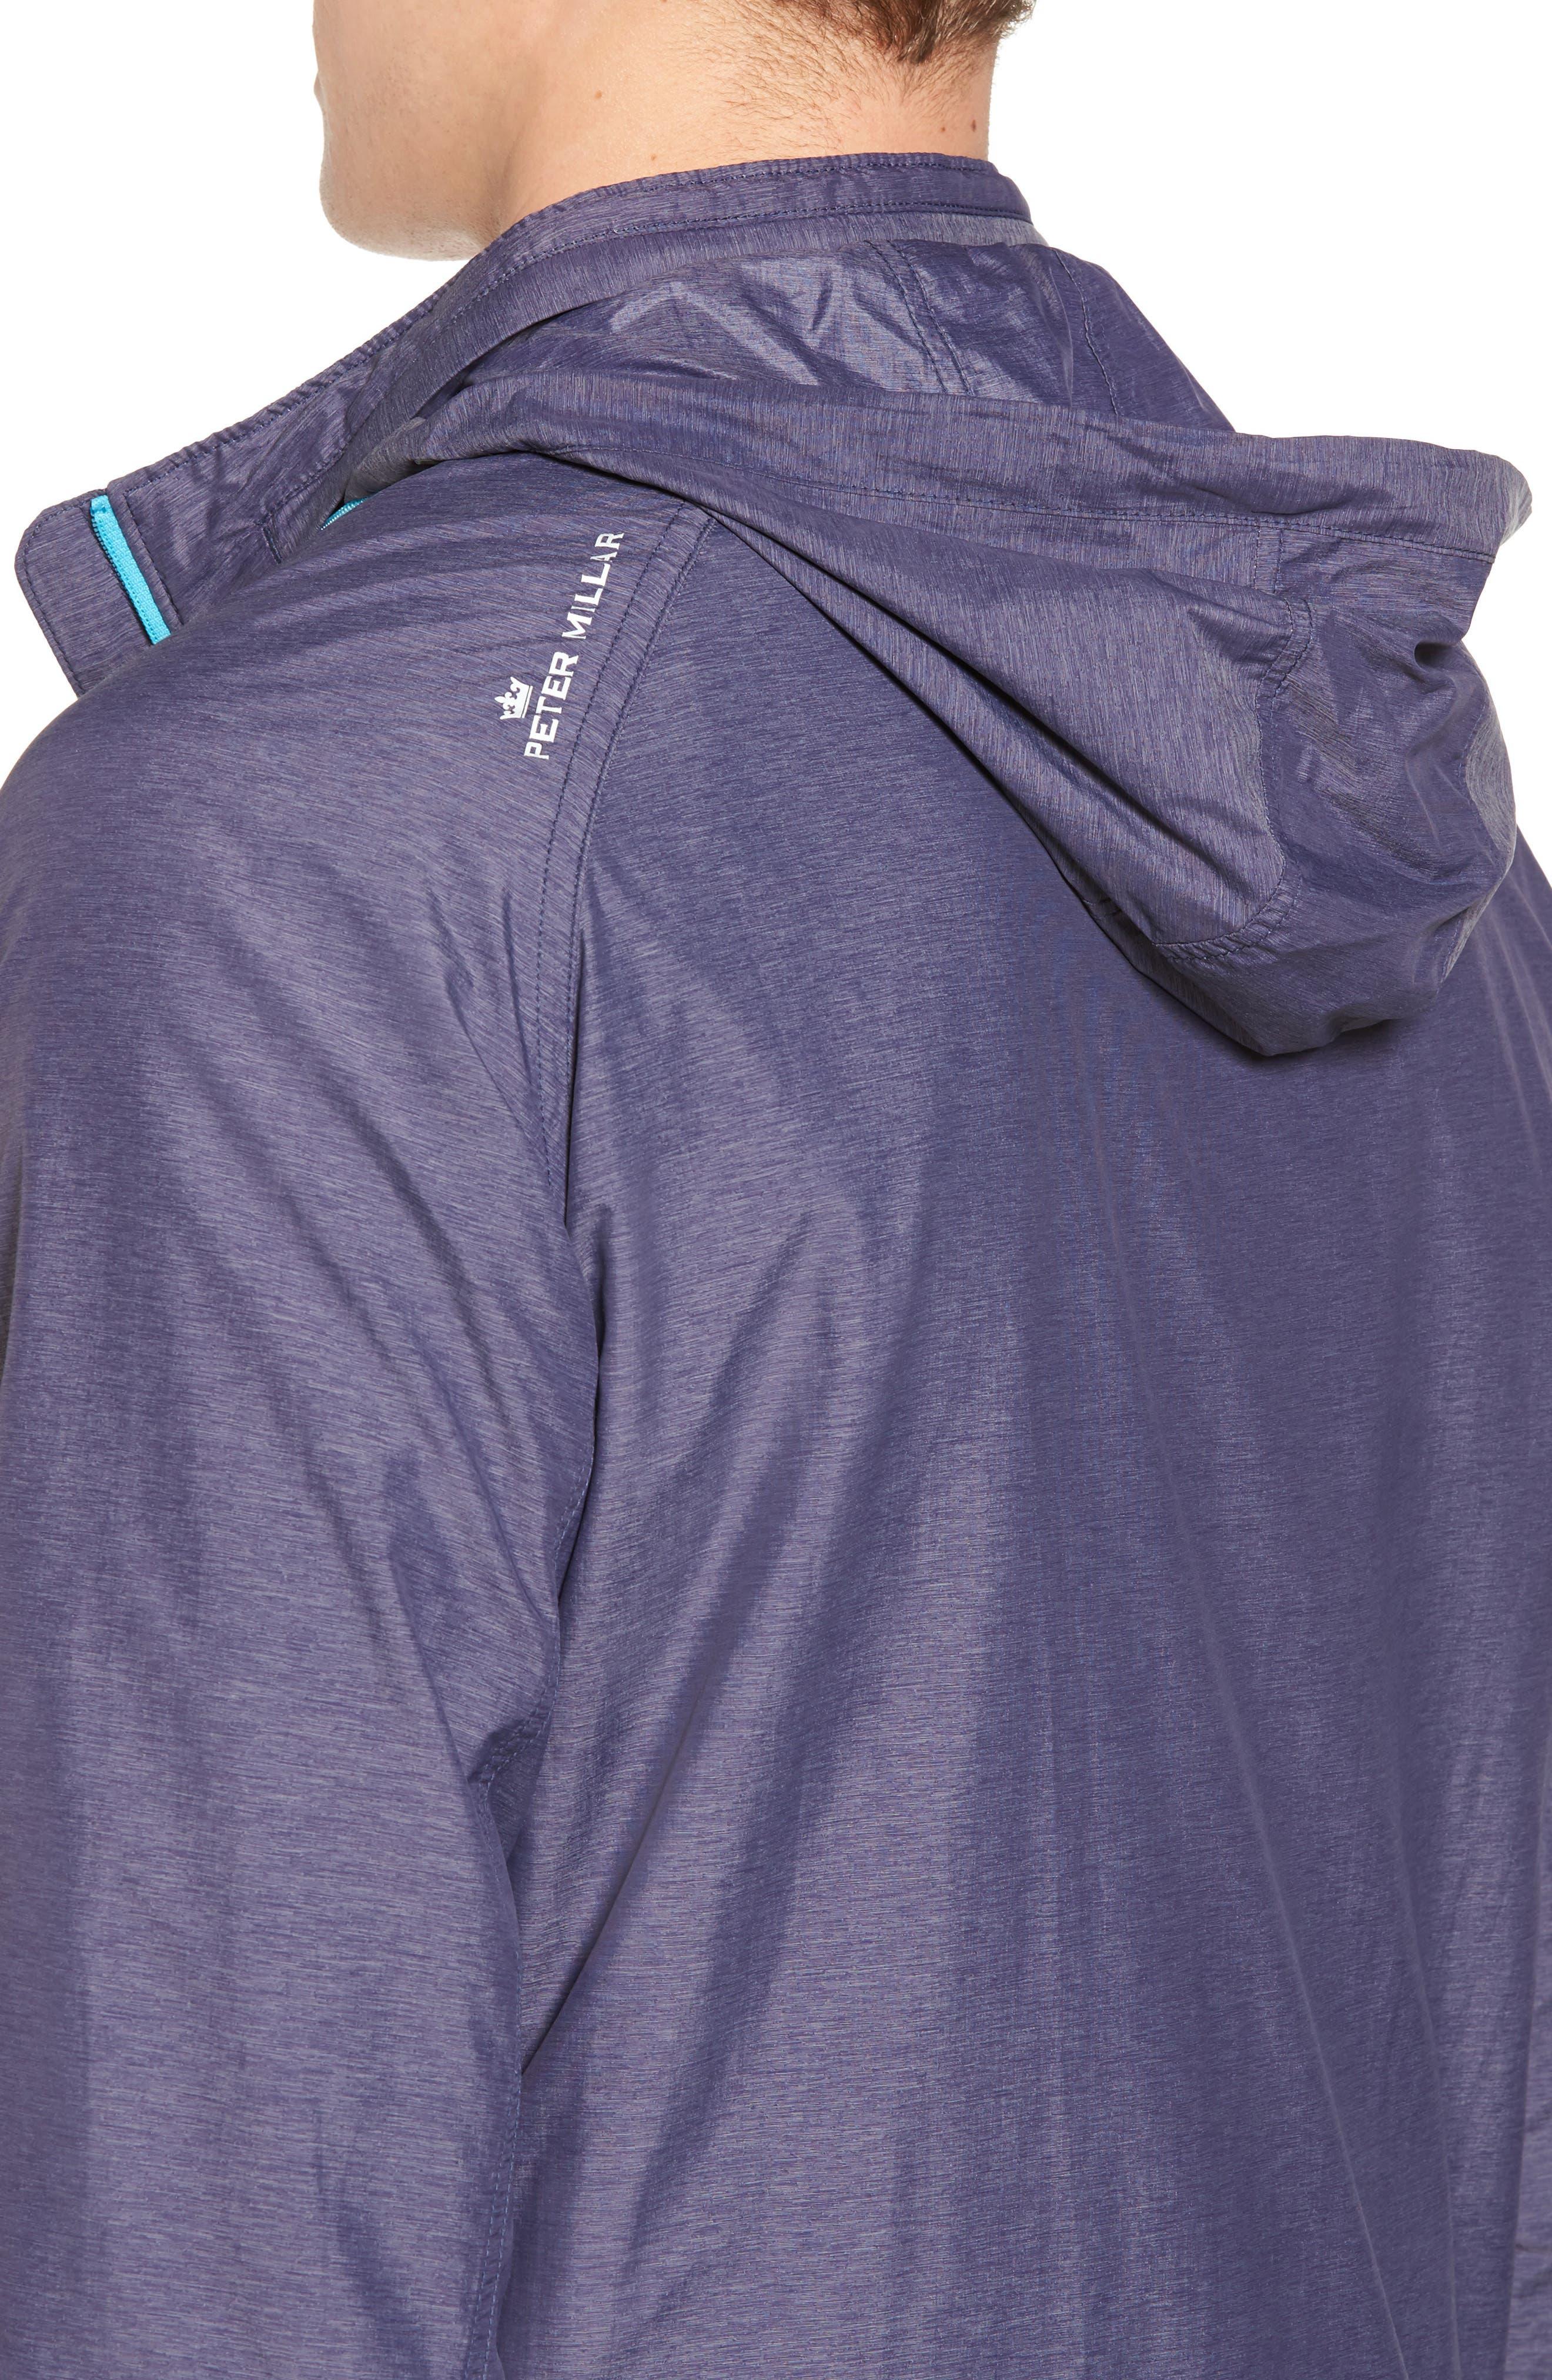 Nagano Windbreaker Jacket,                             Alternate thumbnail 8, color,